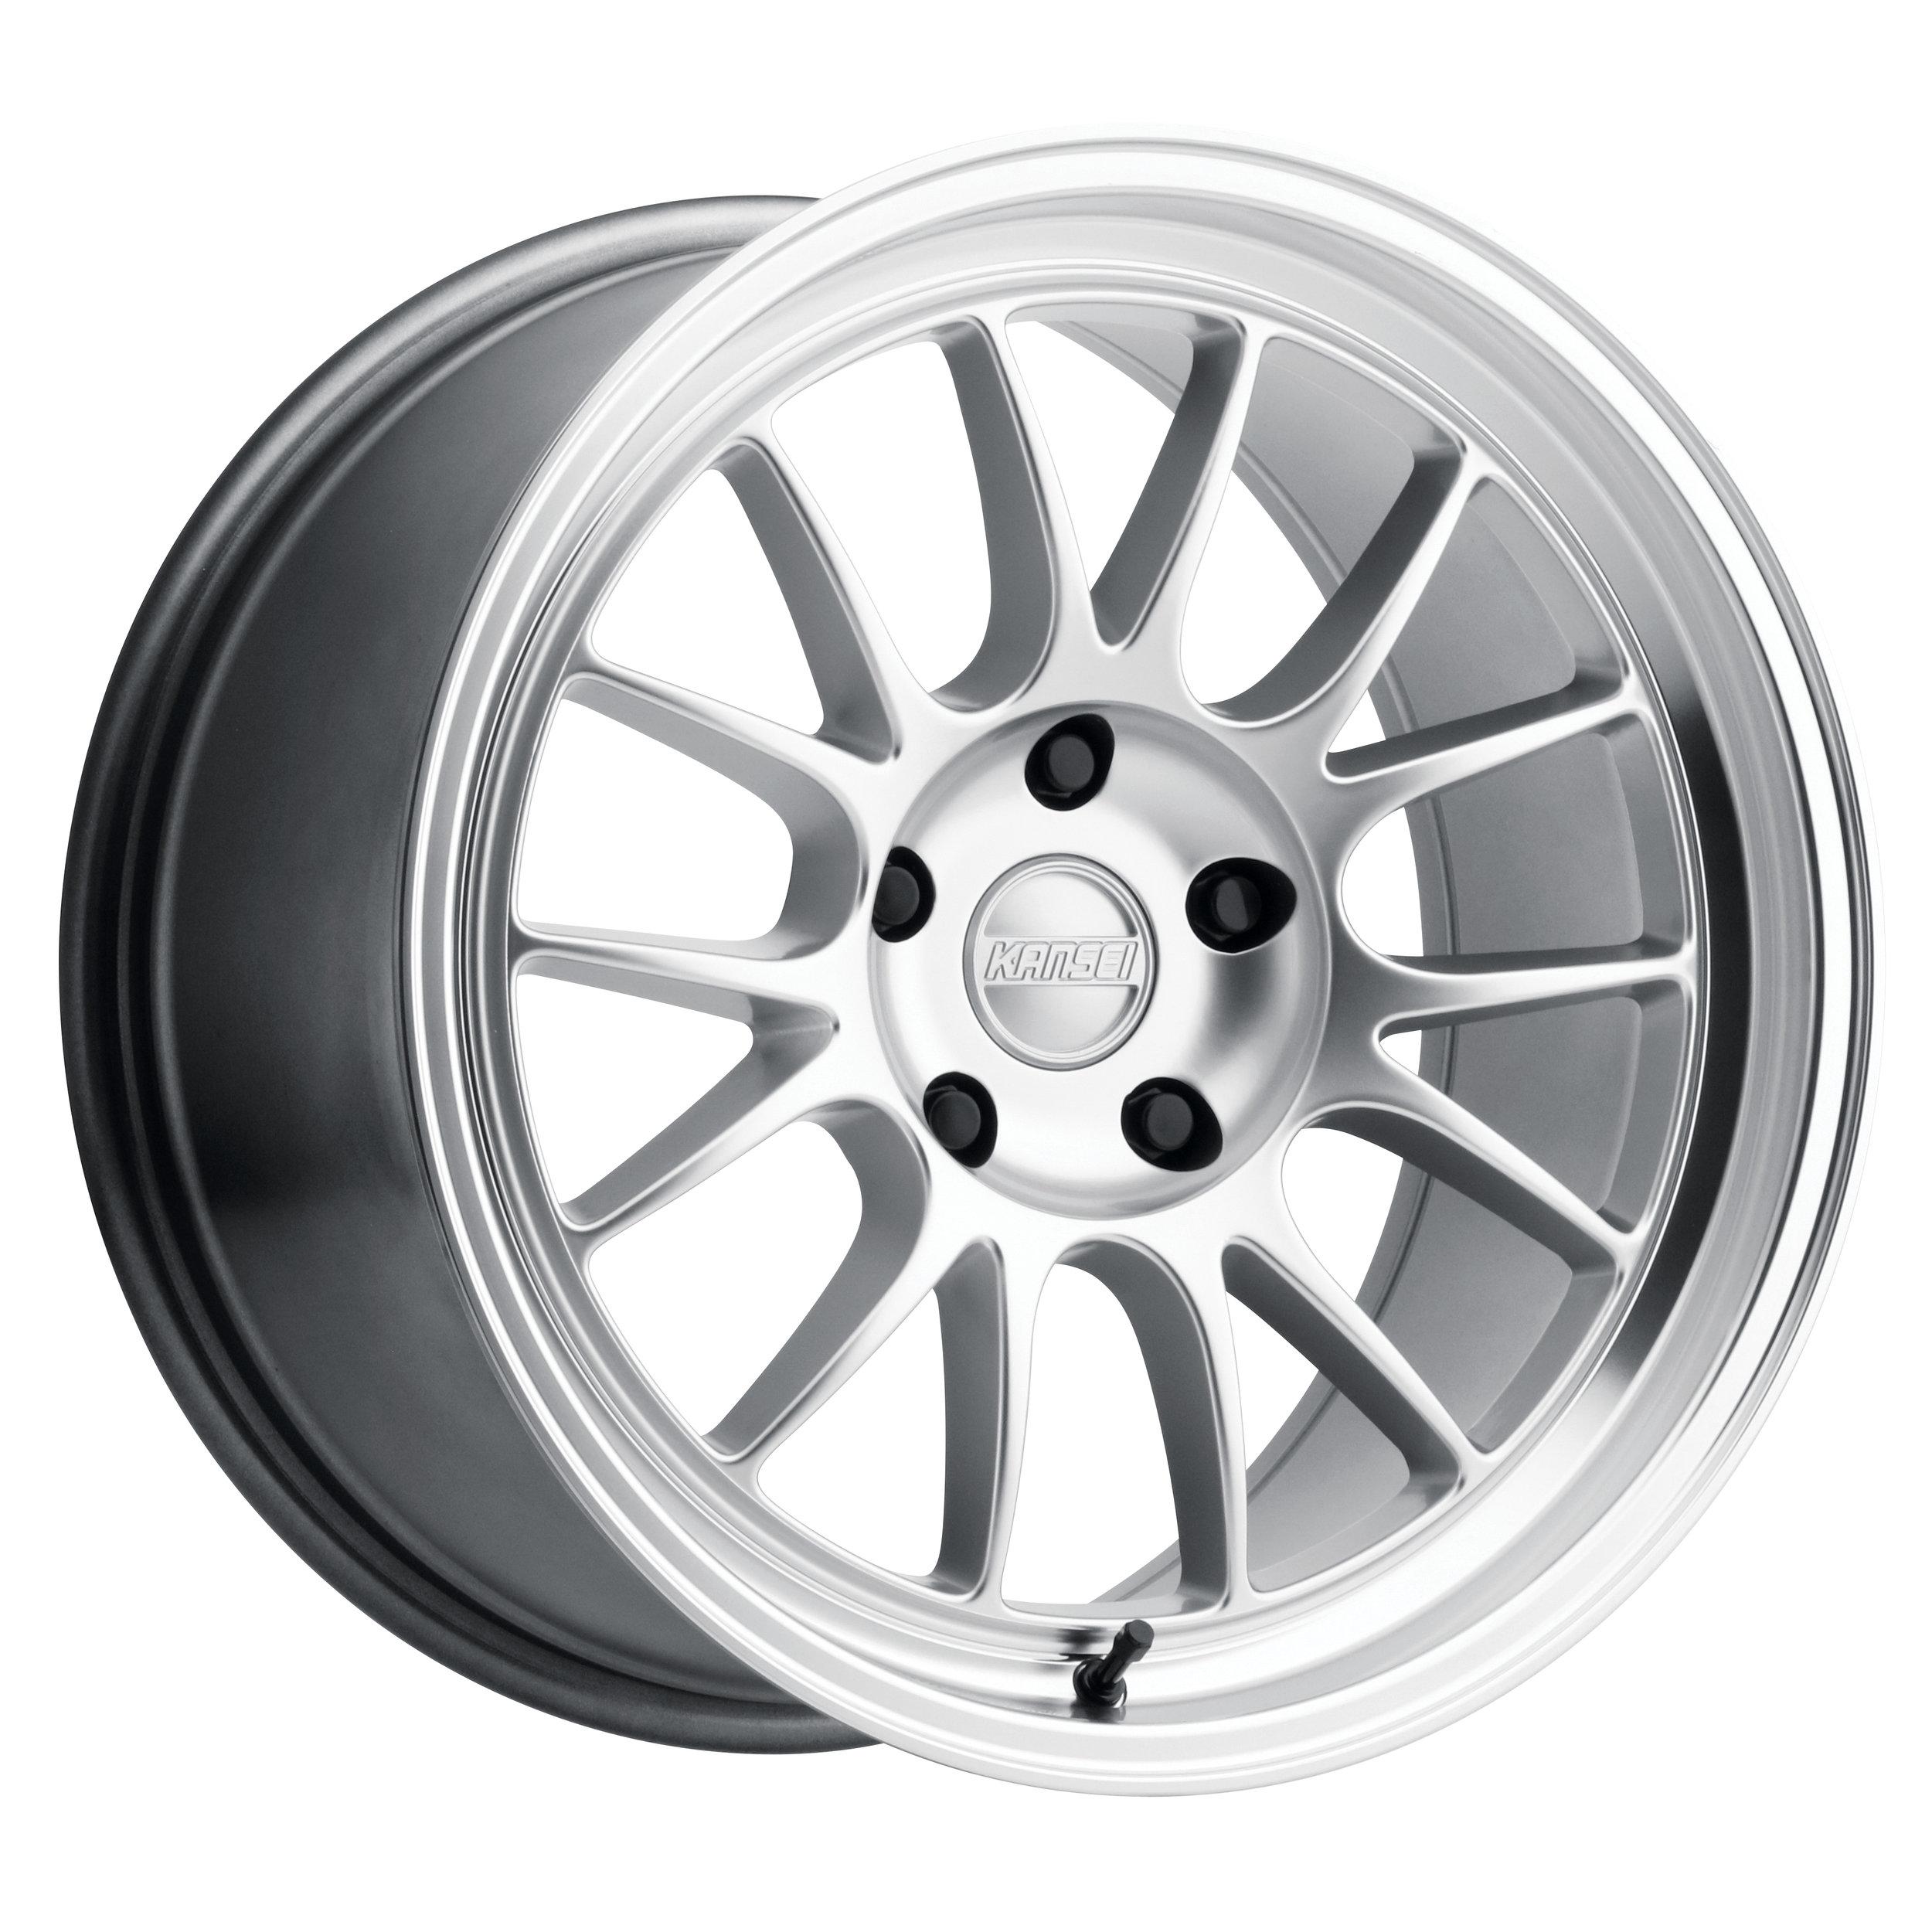 Corsa - 18x9.5 - Hyper silver w/ Polished Lip.